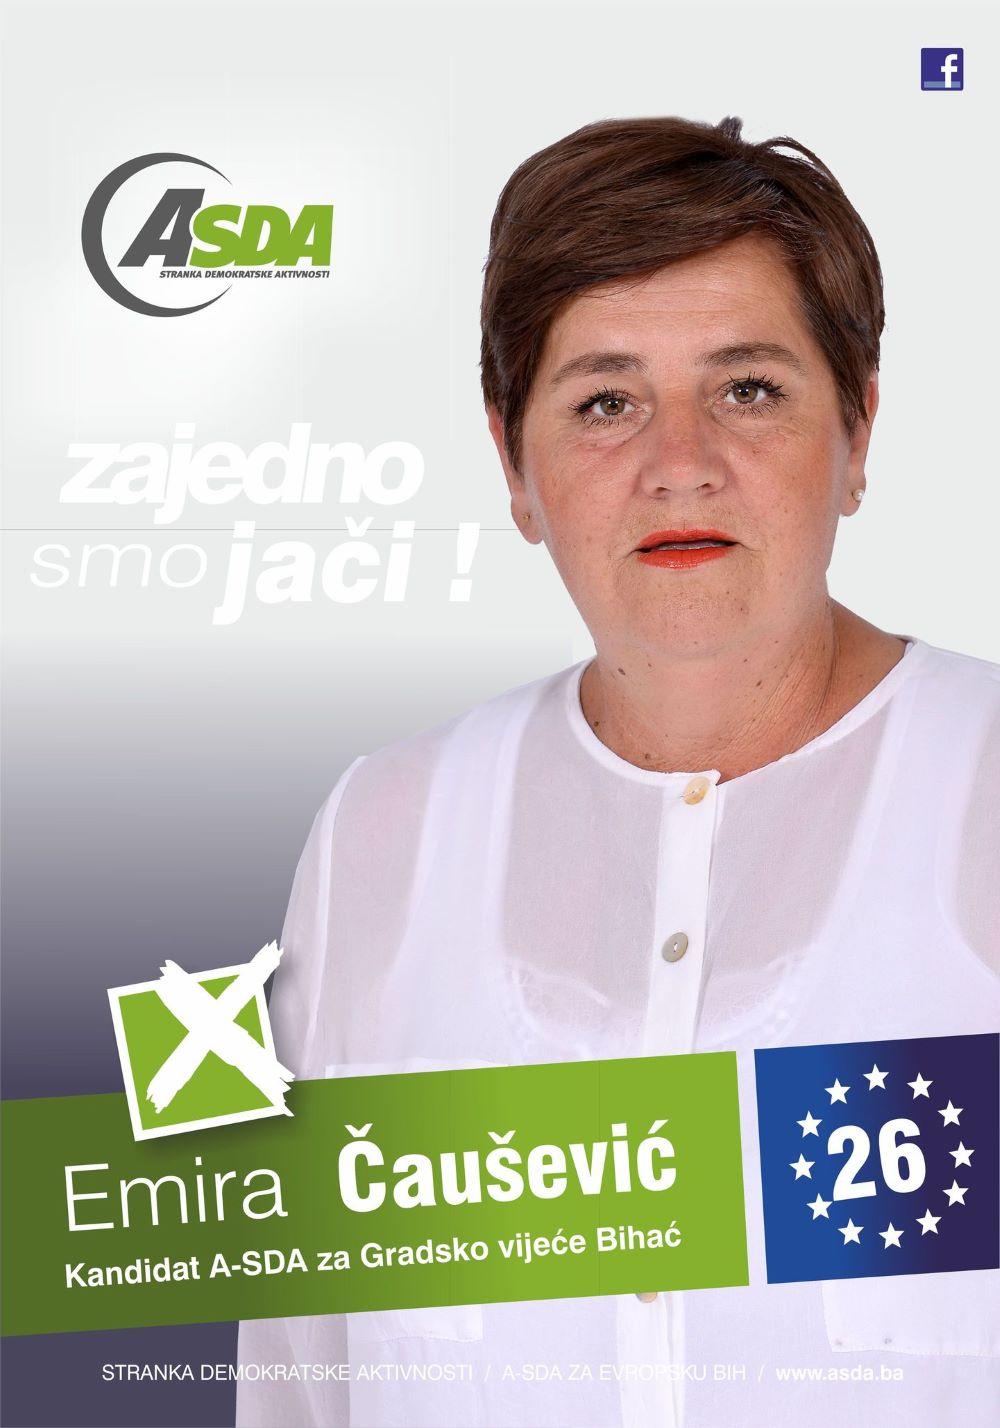 Emira Čaušević